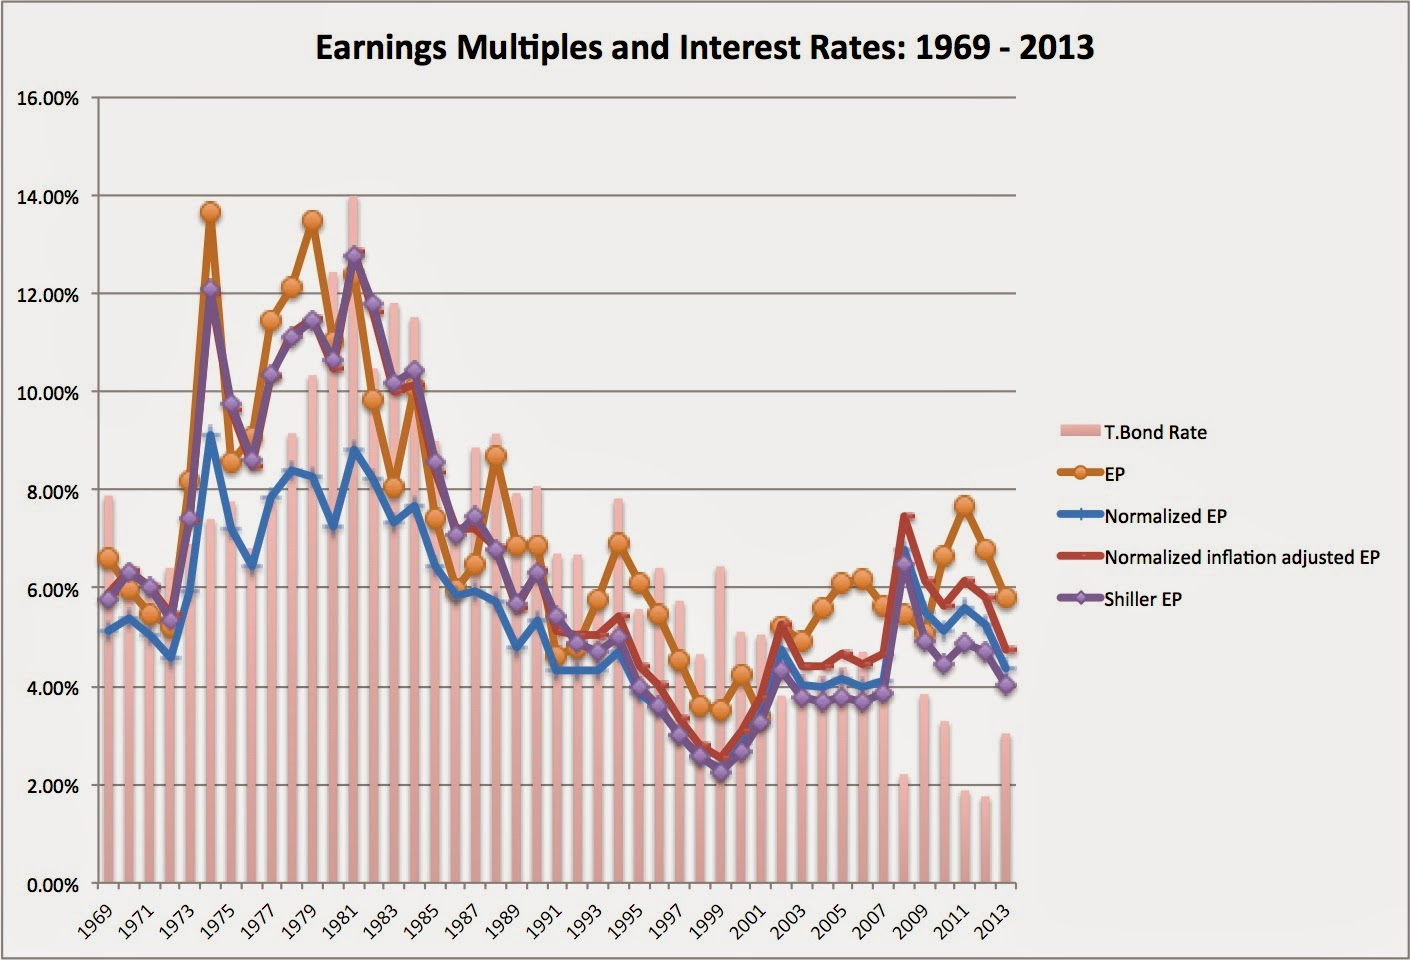 Price Earnings Ratio